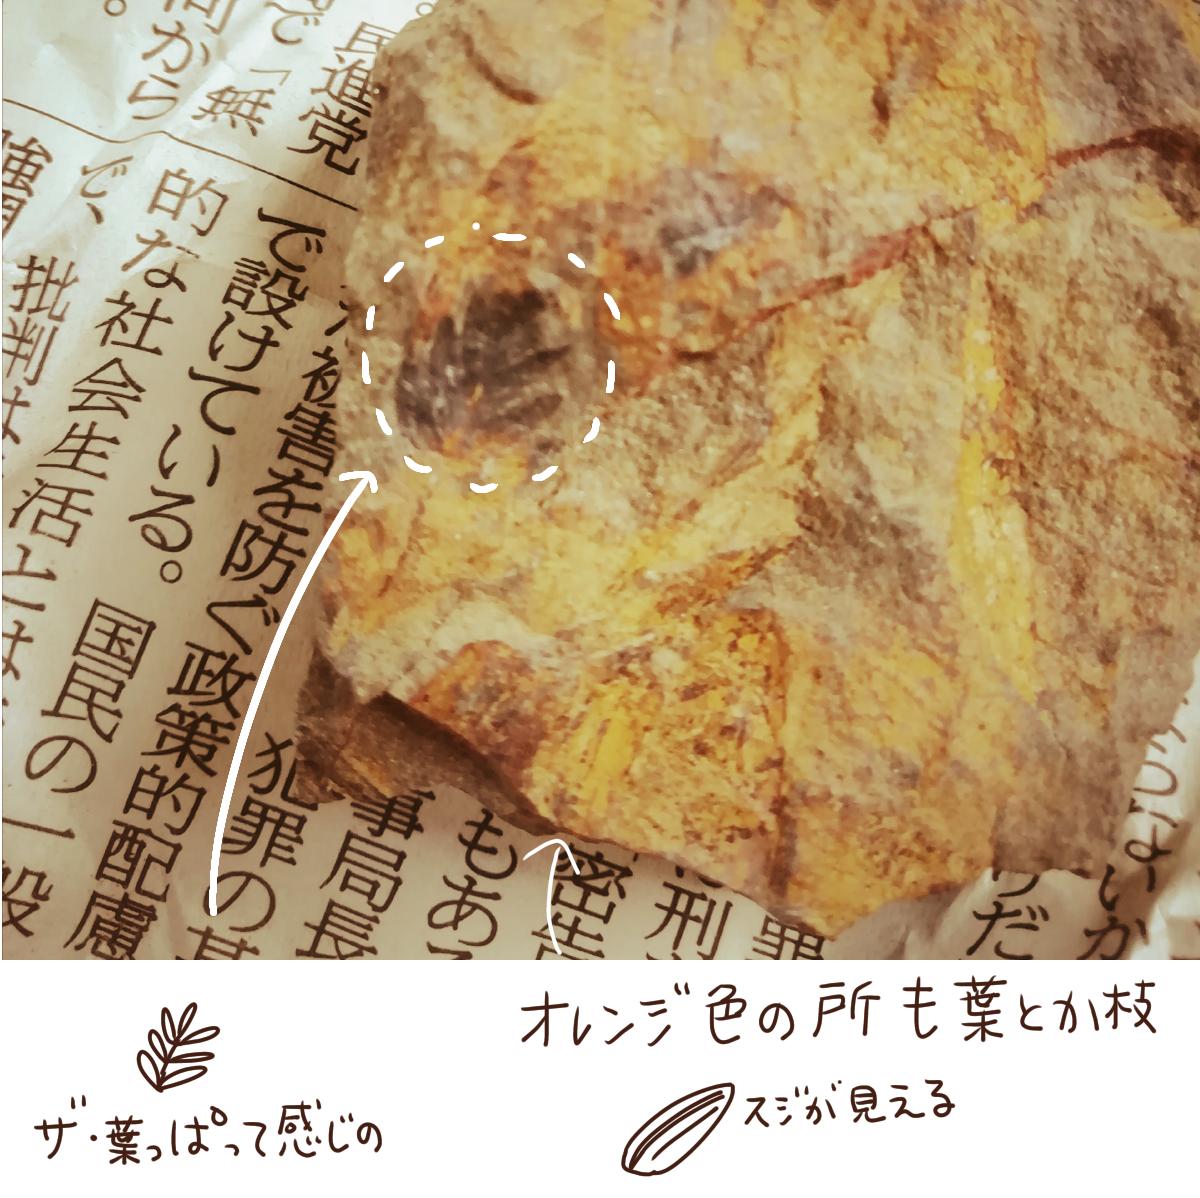 f:id:tukatukasa:20200925141954p:image